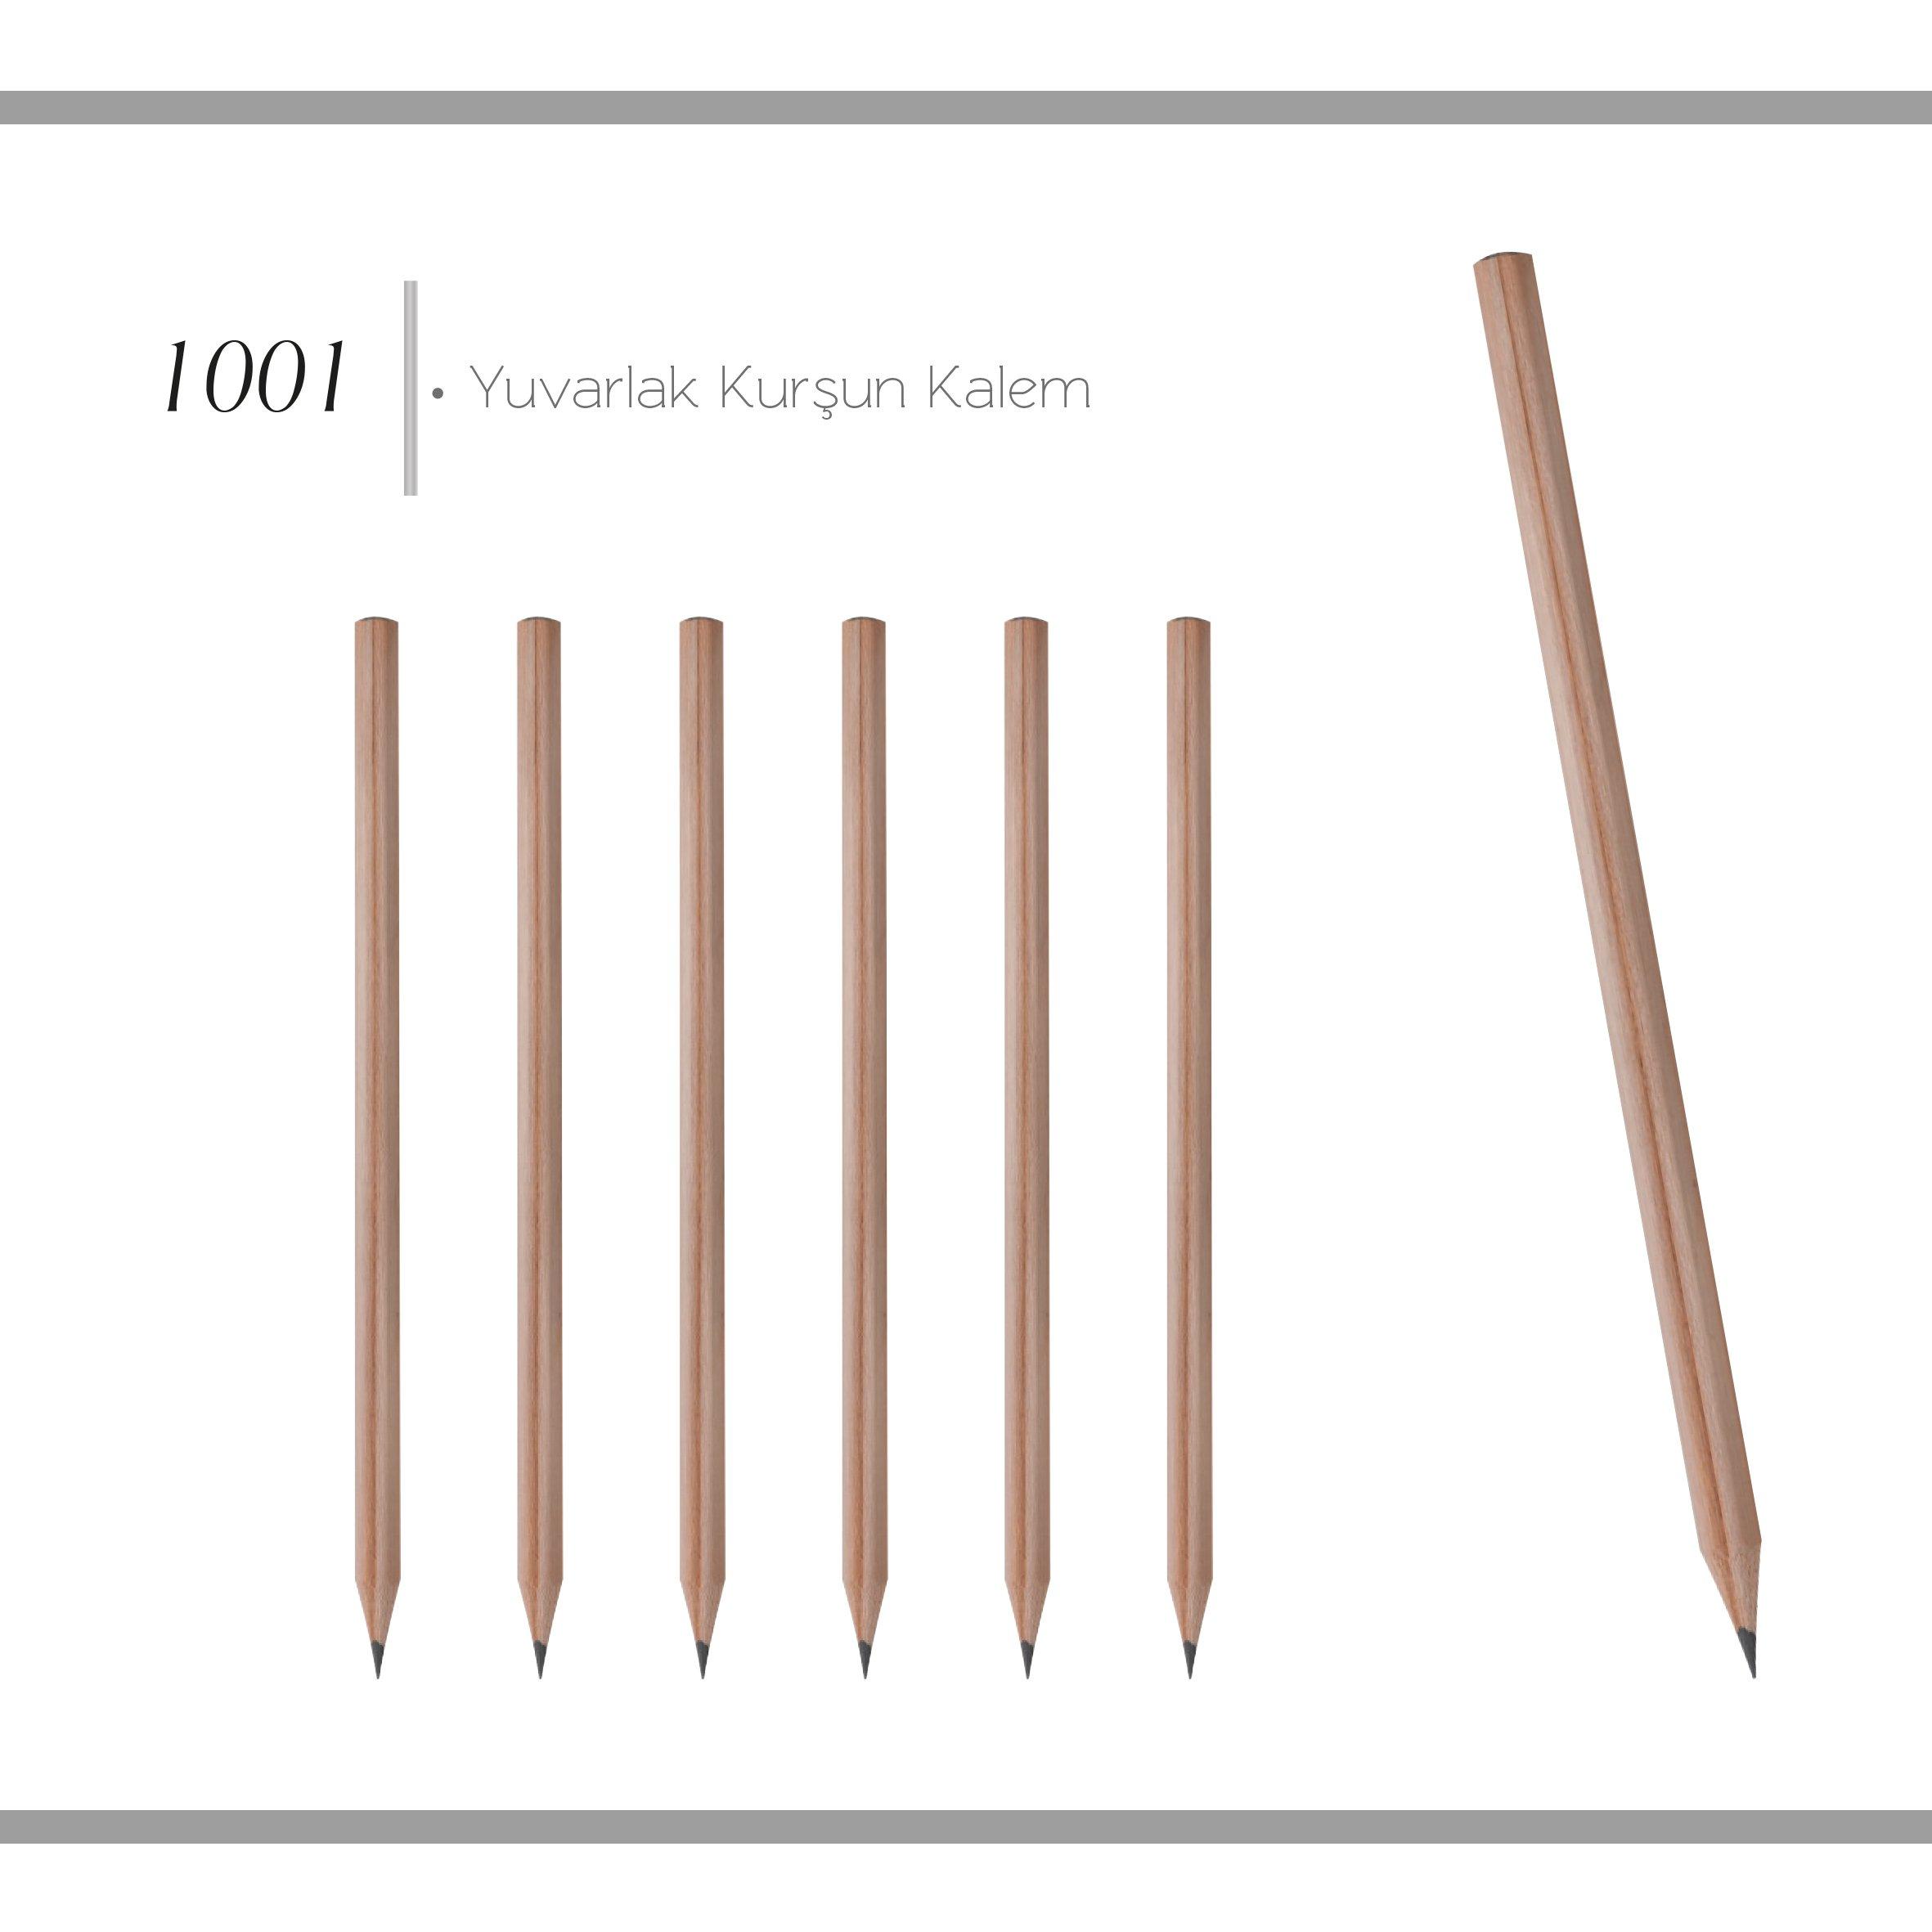 promosyon-promosyon ürünleri-promosyon kalemler-kurşun kalemler-promosyon ahşap kurşun kalem 1001